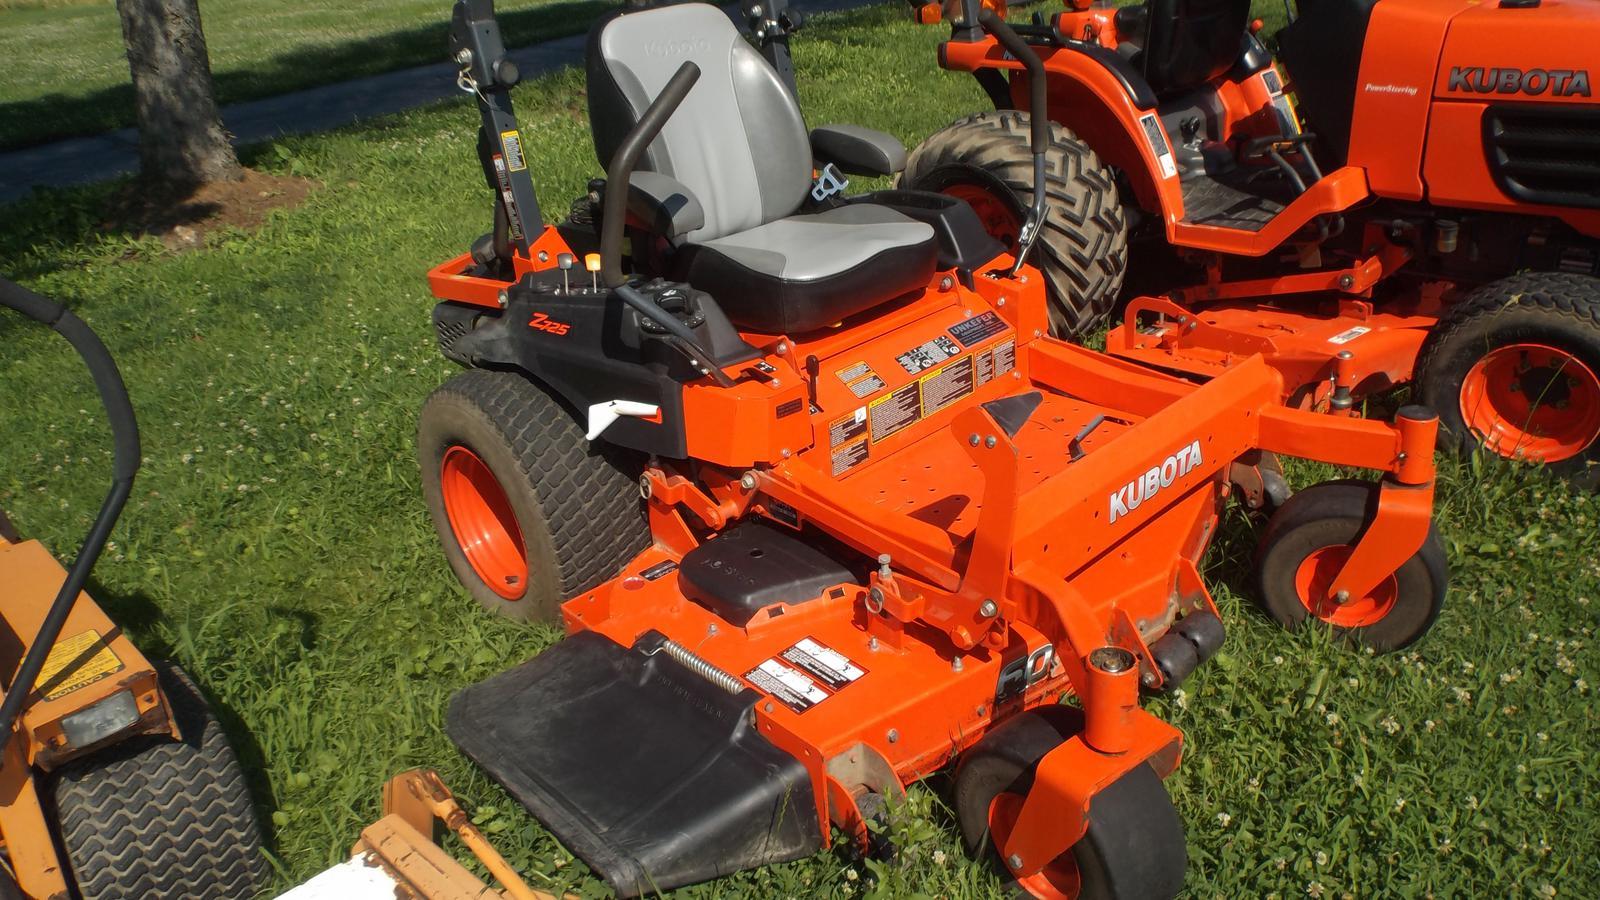 Inventory Homer Unkefer Farm Equipment Minerva, OH (330) 868-6419